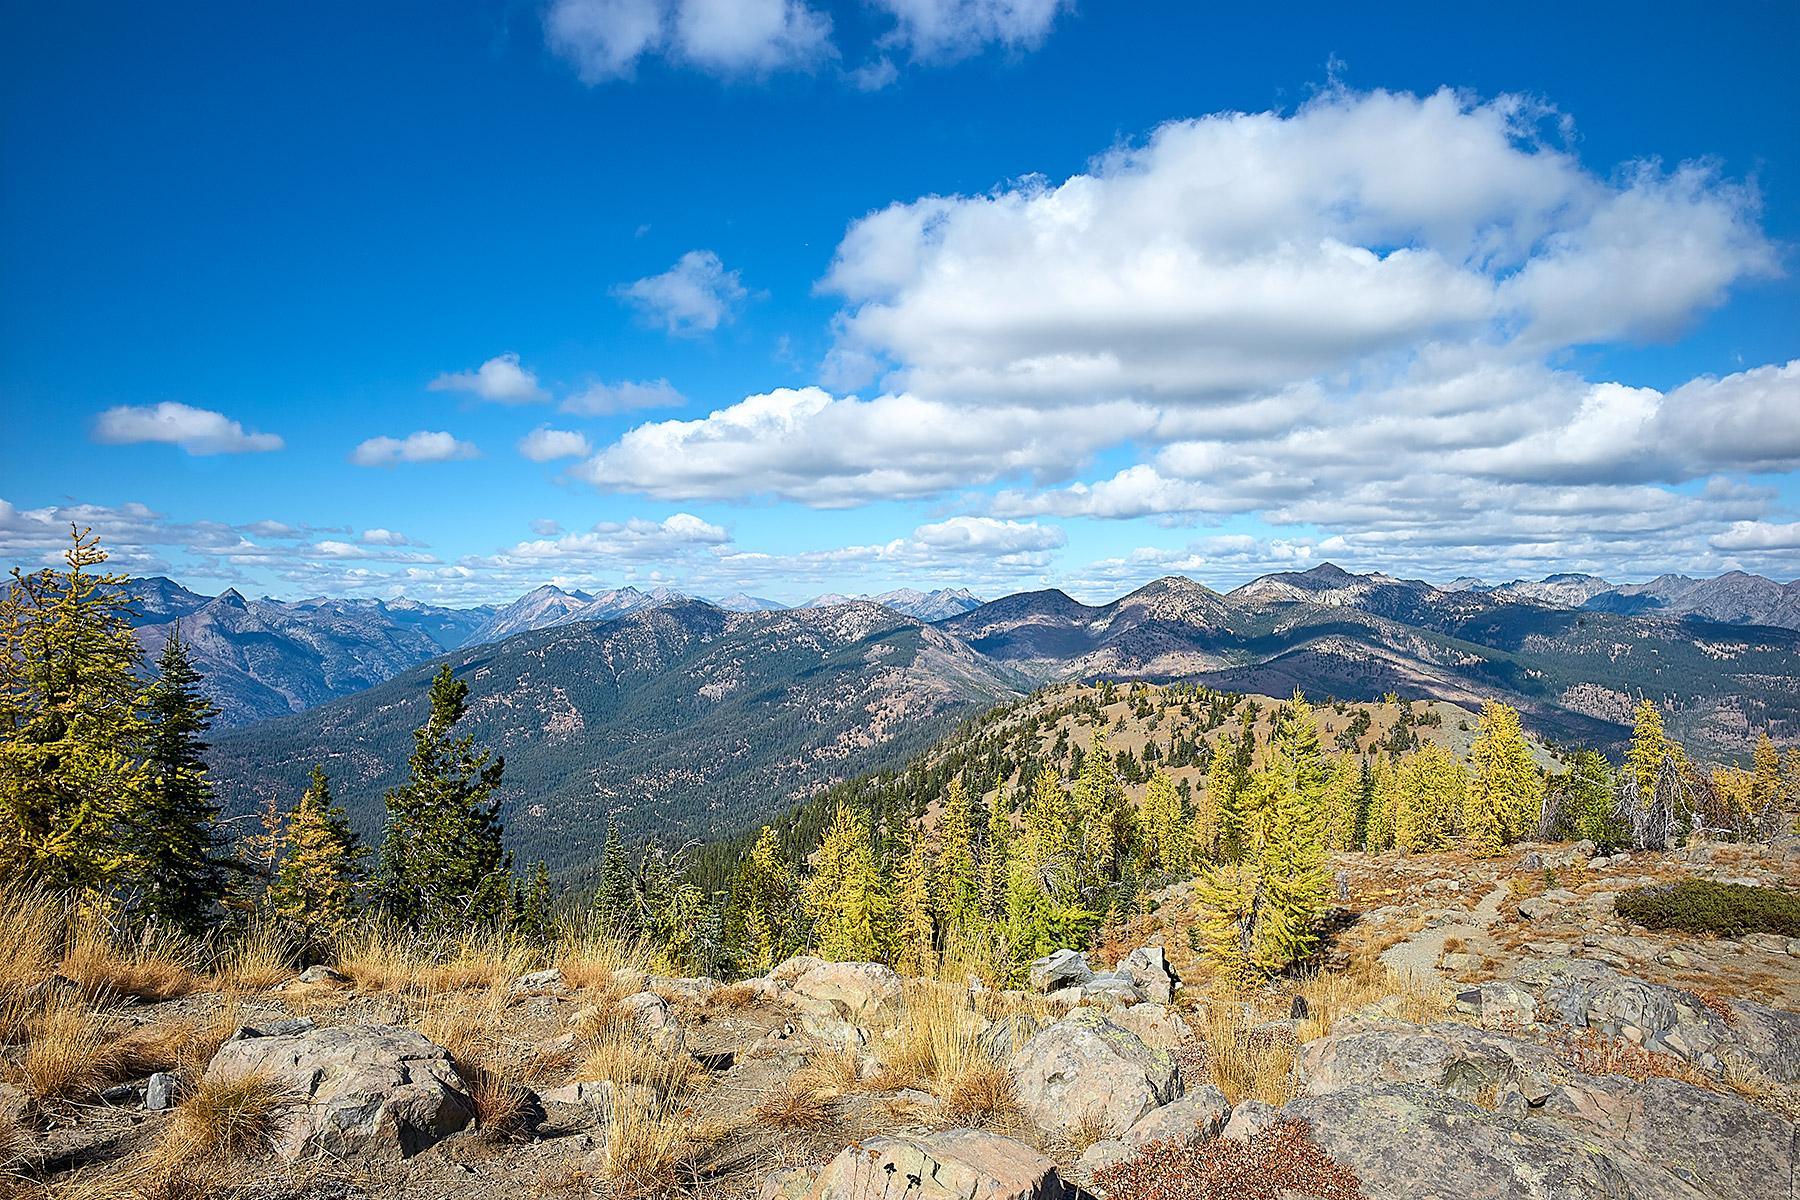 Trail to Goat Peak Lookout, Washington State © johncameron.ca